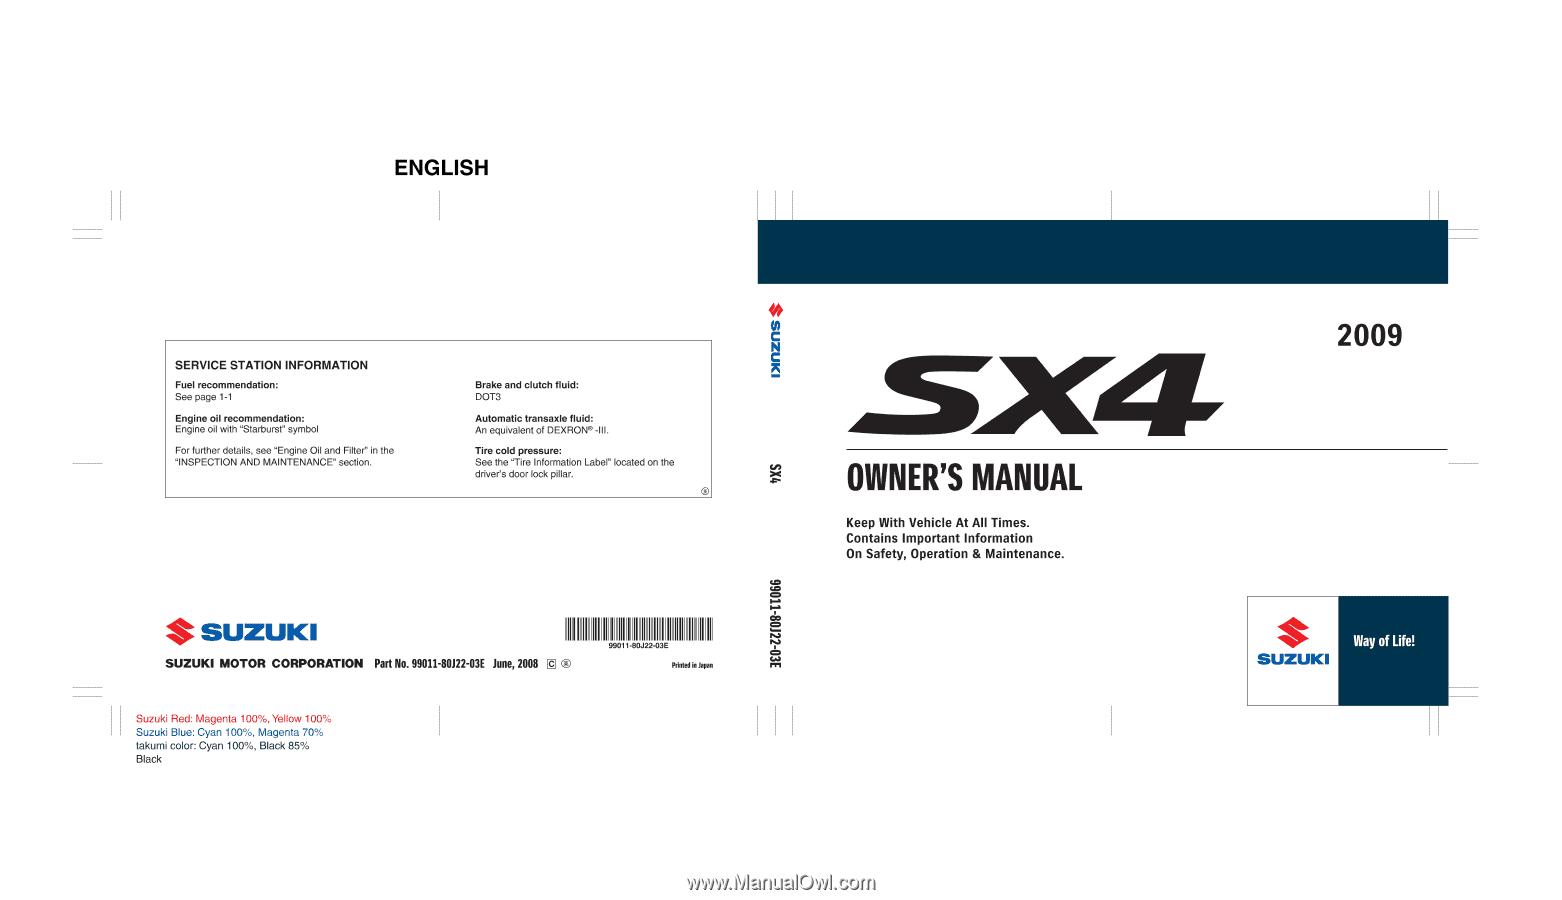 2008 Suzuki Sx4 Owners Manual Wiring Diagram 2009 Owner S Rh Manualowl Com Pdf